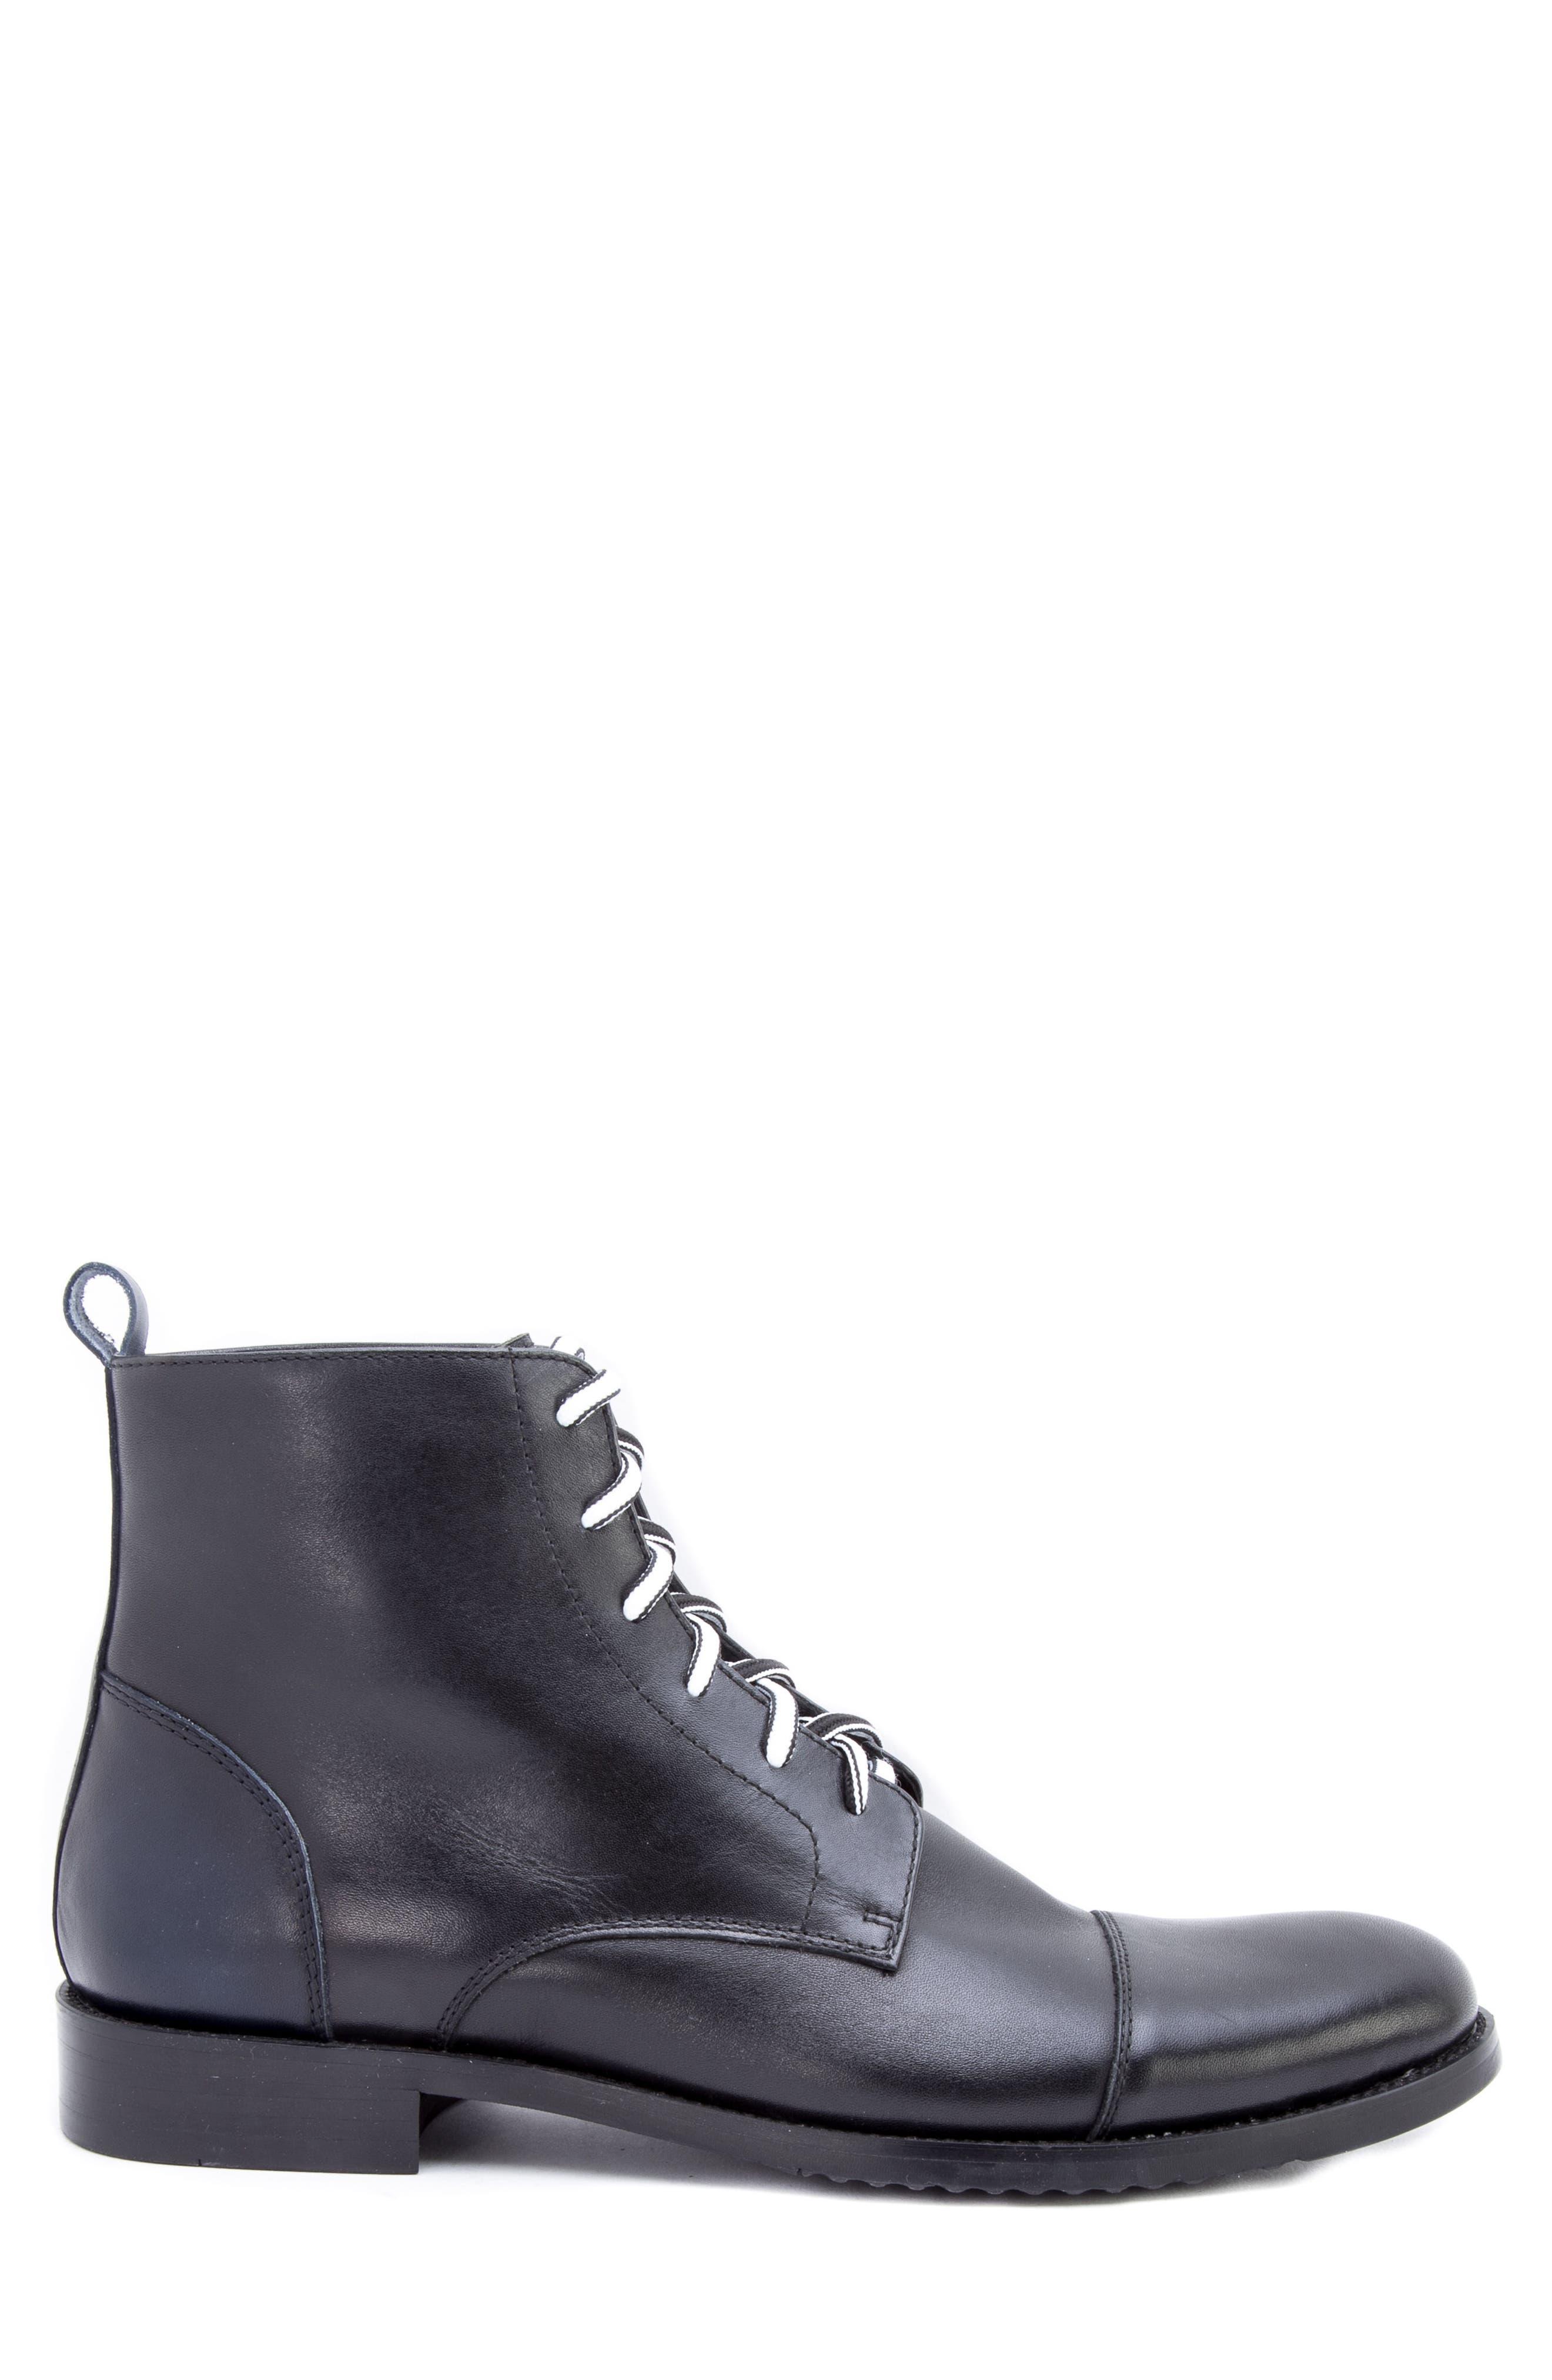 Lombardo Cap Toe Boot,                             Alternate thumbnail 3, color,                             001